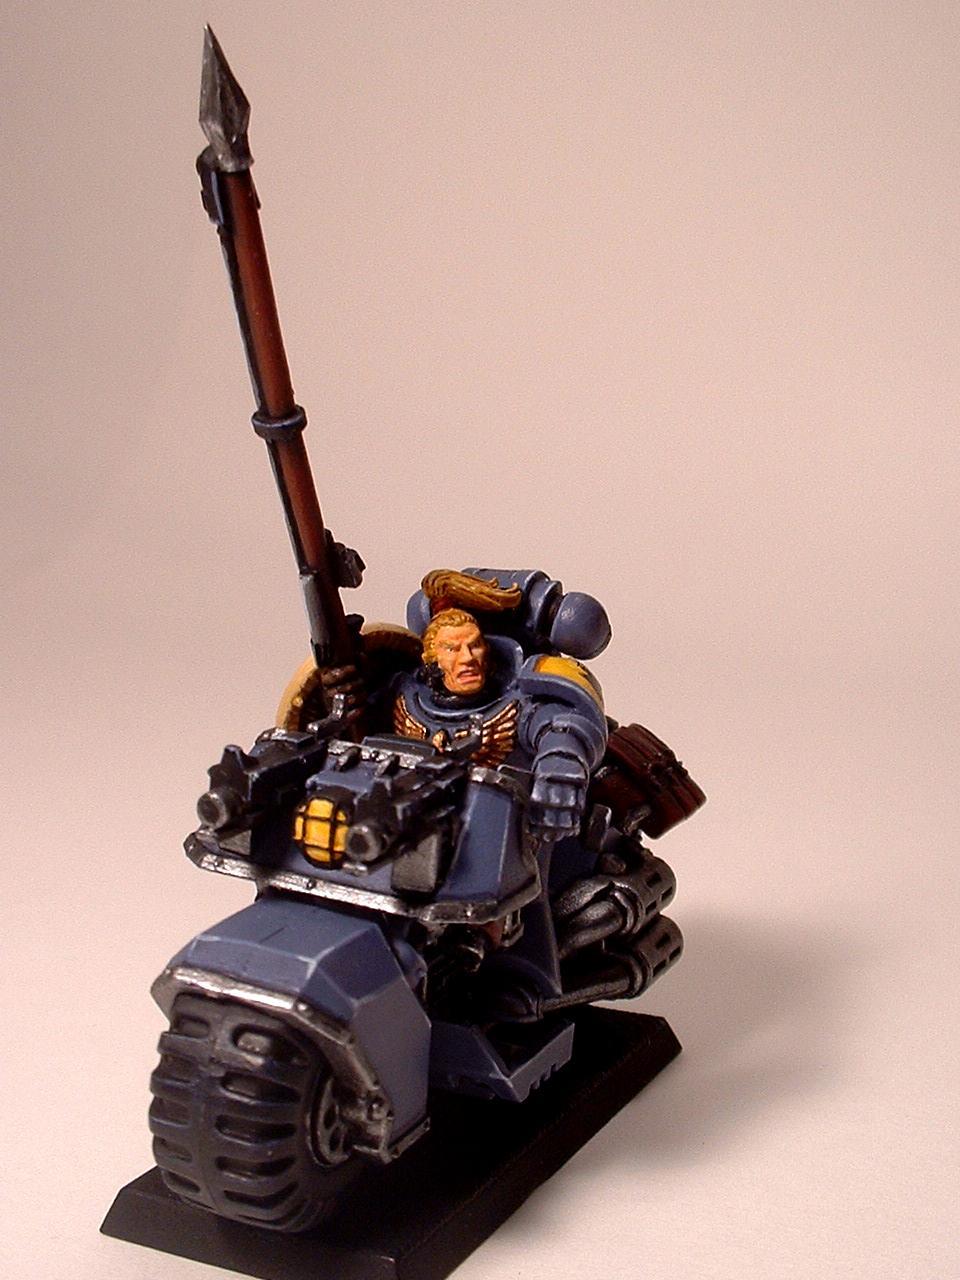 Blood Claw, Space Marine Bike, Space Wolves, Swift Claw, Warhammer 40,000